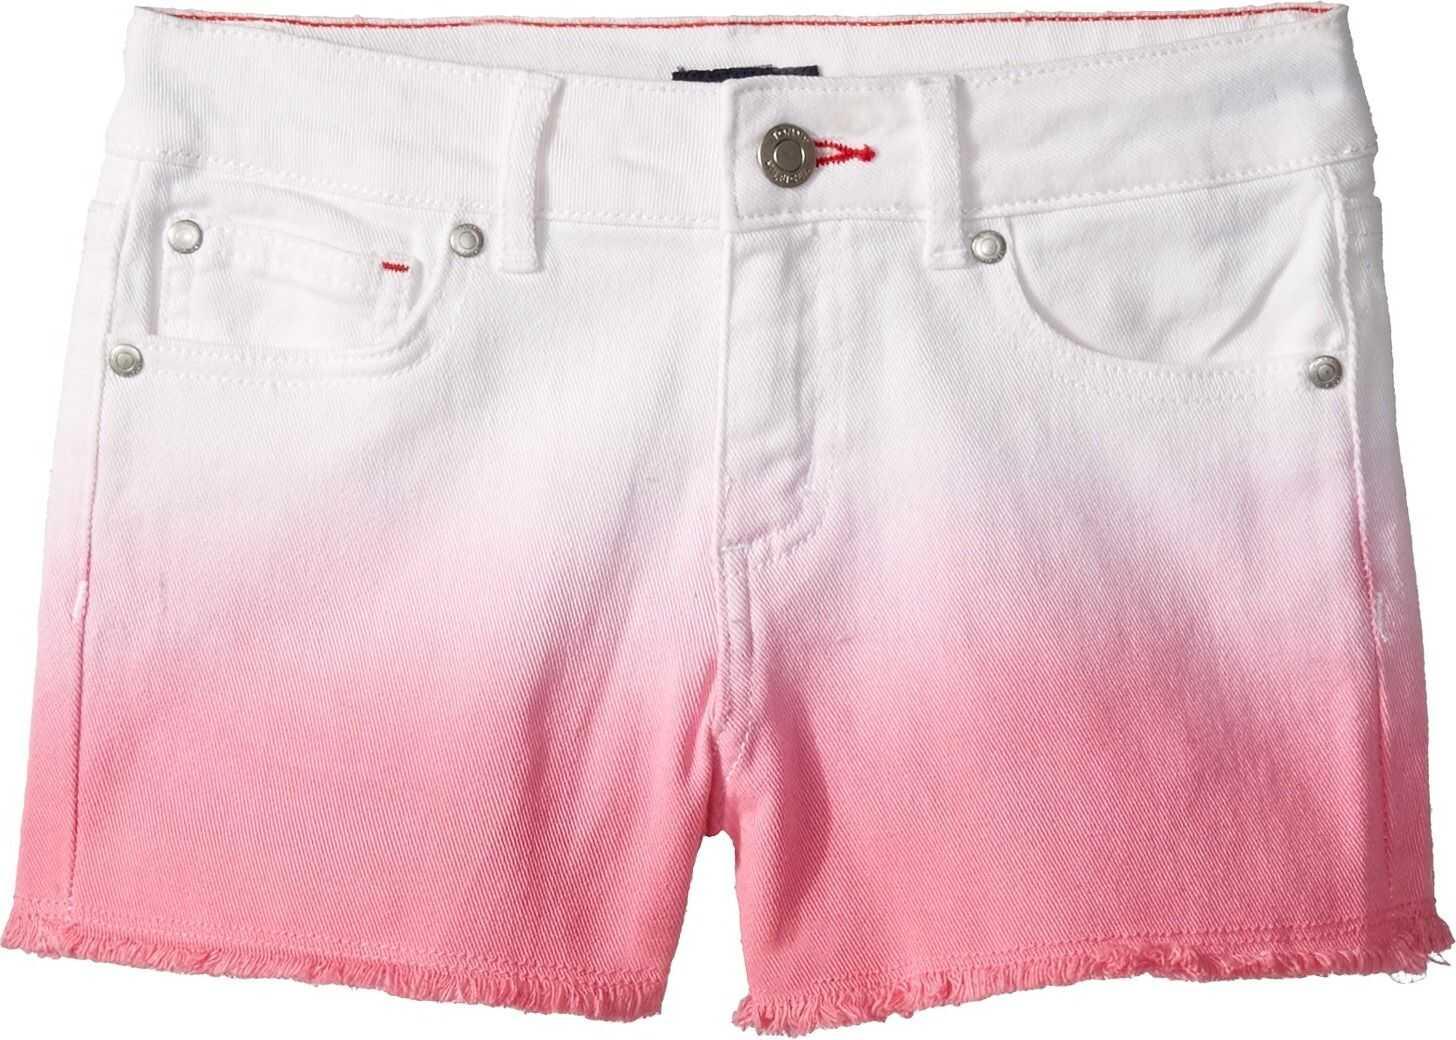 Dip-Dyed Denim Shorts in Pink Carnation (Little Kids/Big Kids)